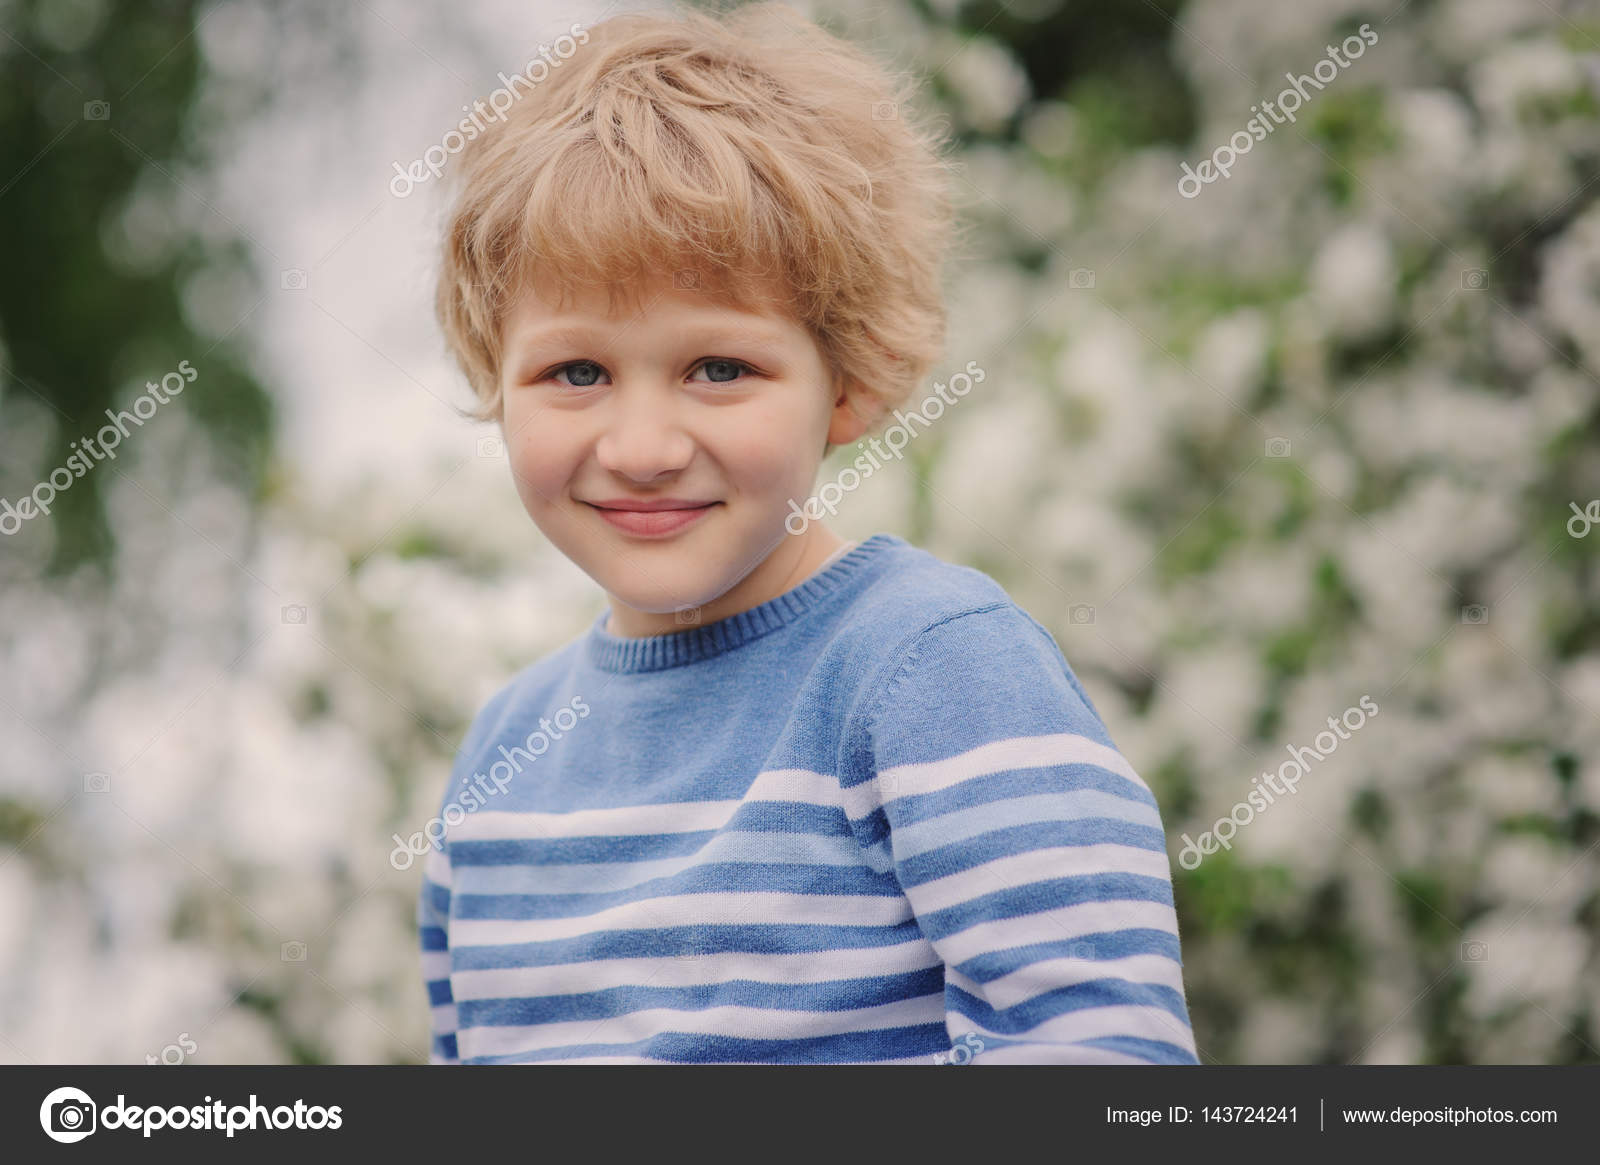 Adorable Blonde Kid Boy Portrait In Blooming Cherry Garden Walking